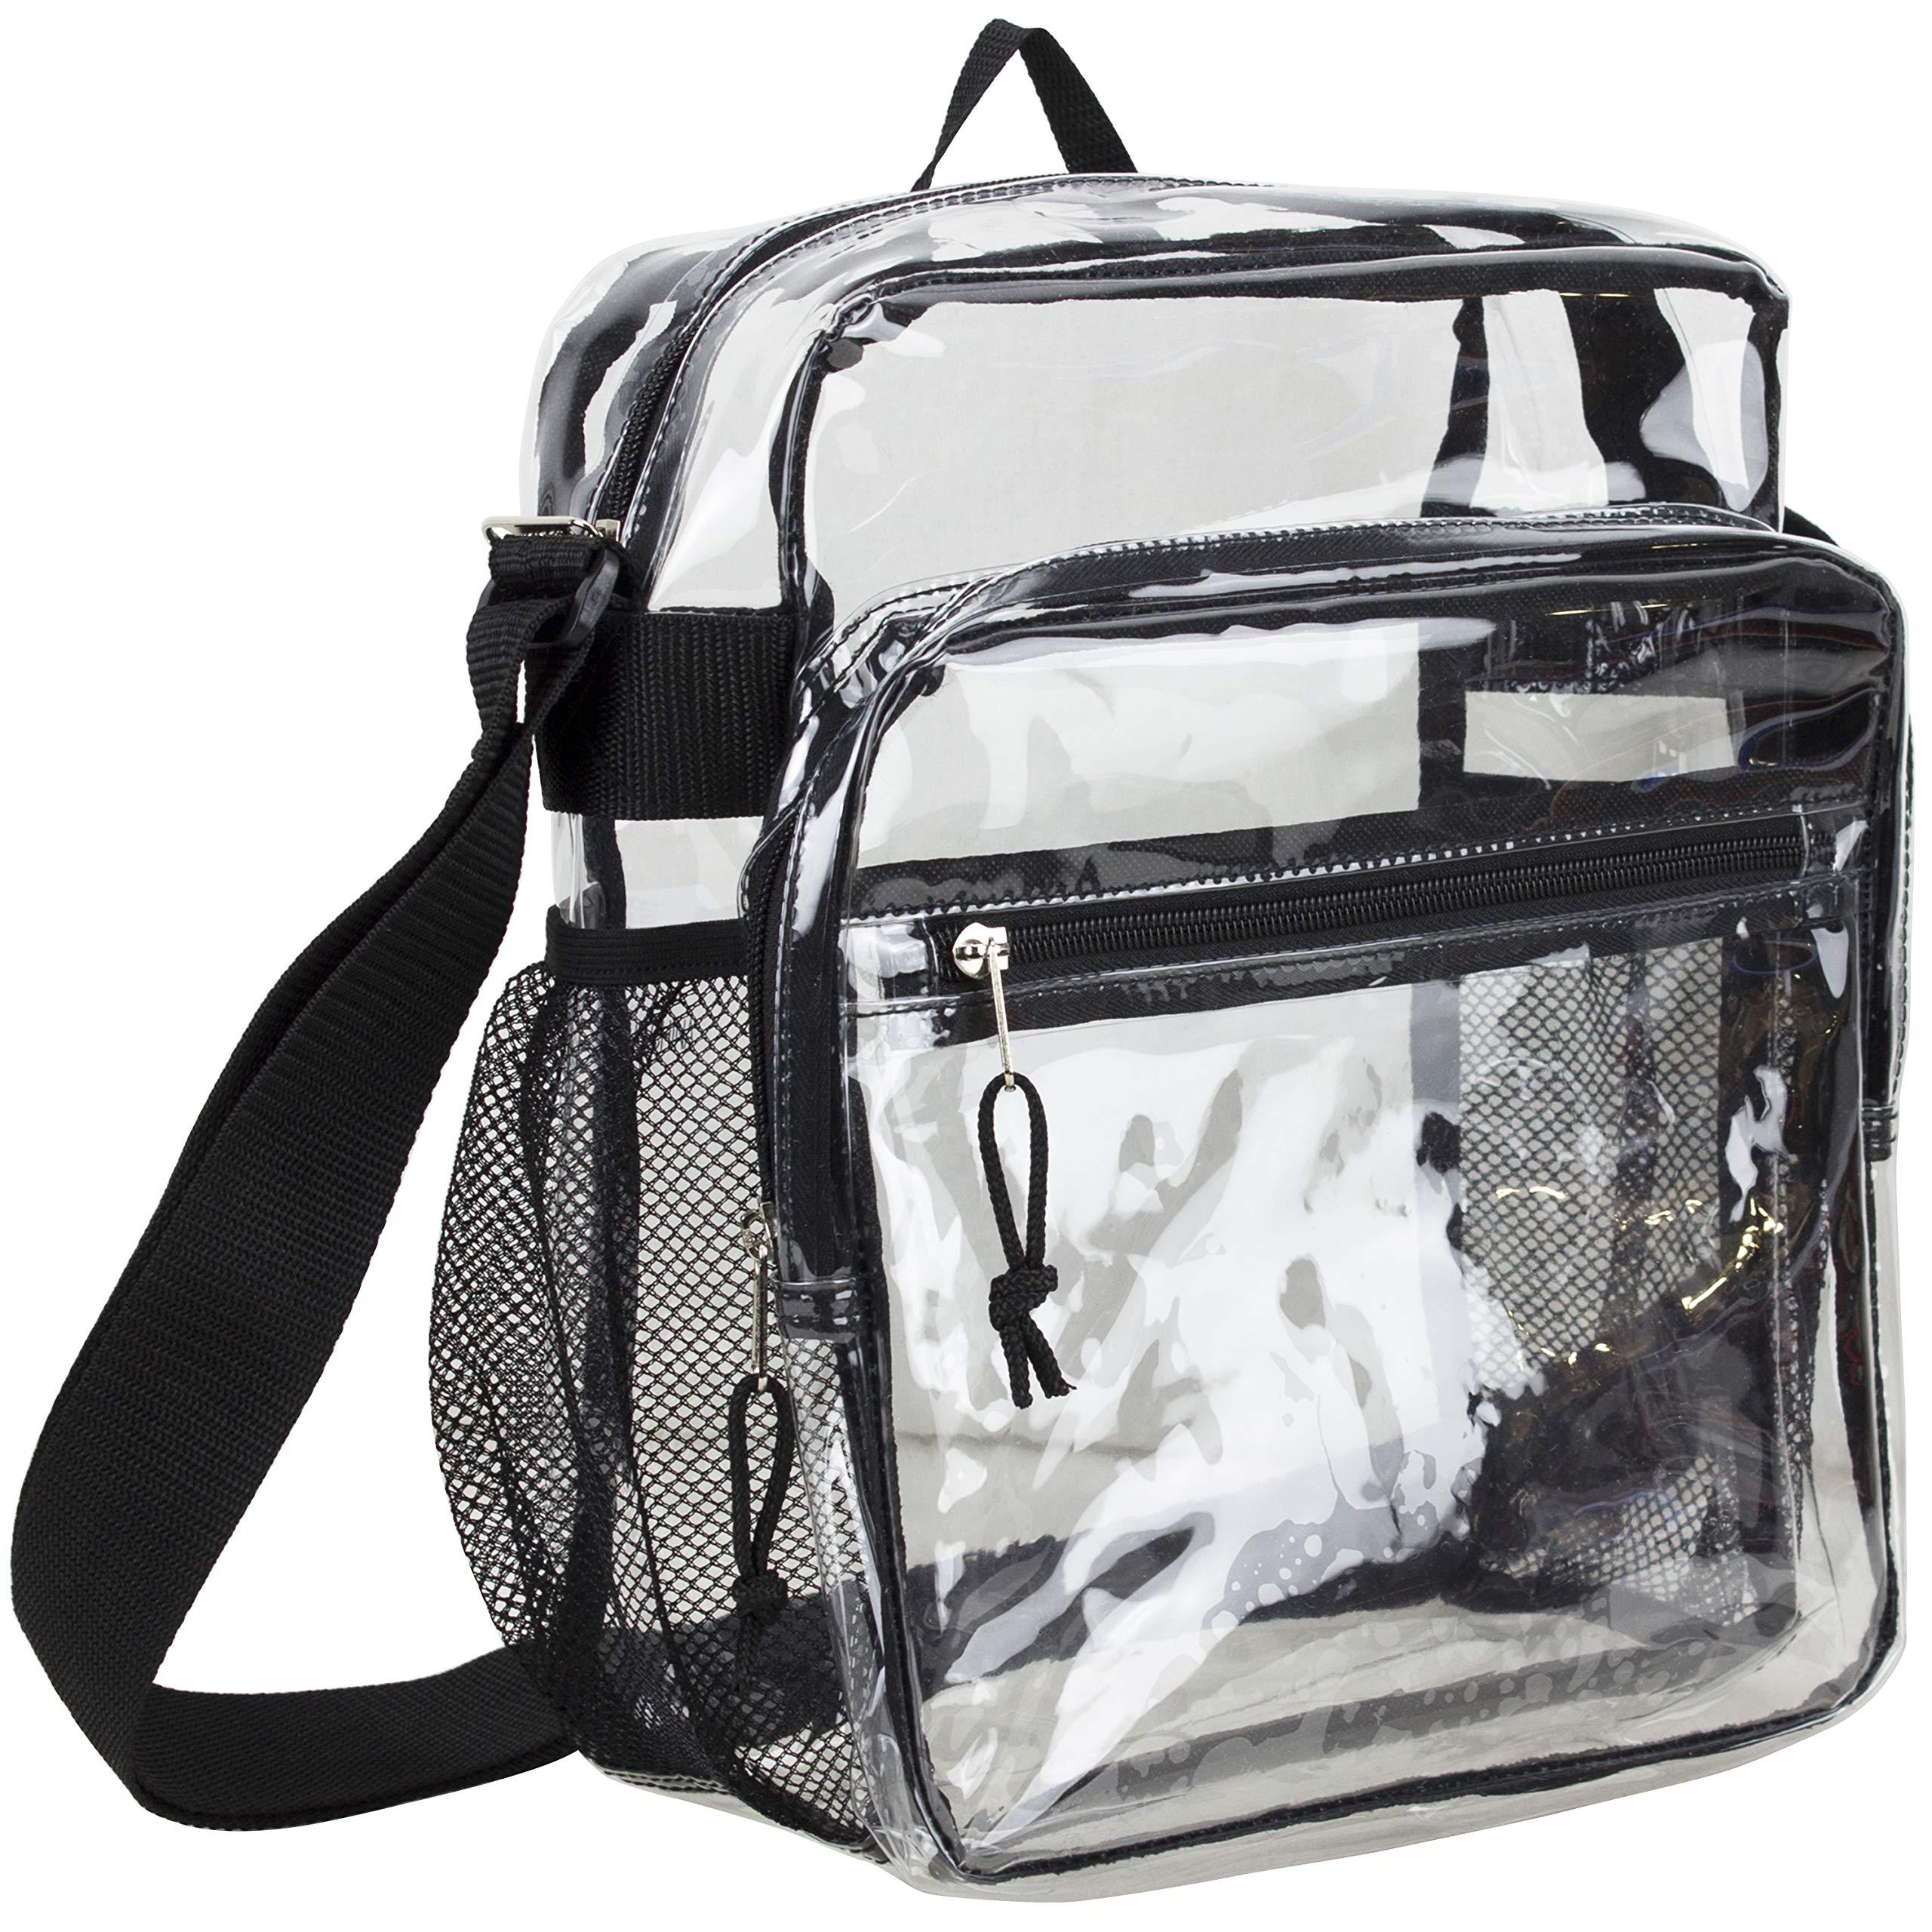 200aaf819e85 Eastsport Clear Stadium Messenger Bag with Adjustable Crossbody ...